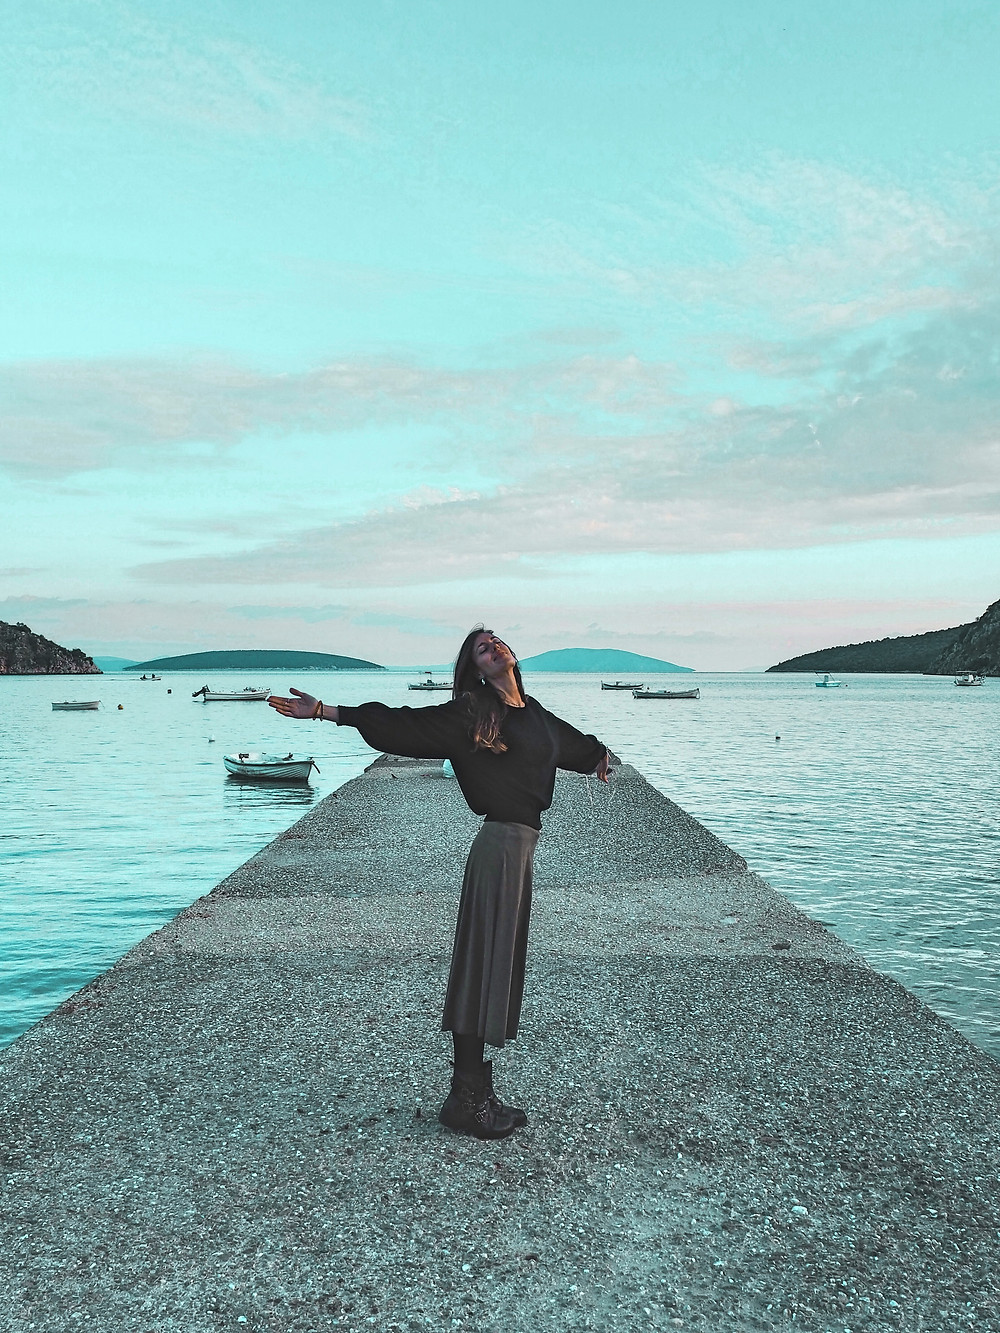 playa, atardecer, calma, relax, felicidad, mar, Grecia